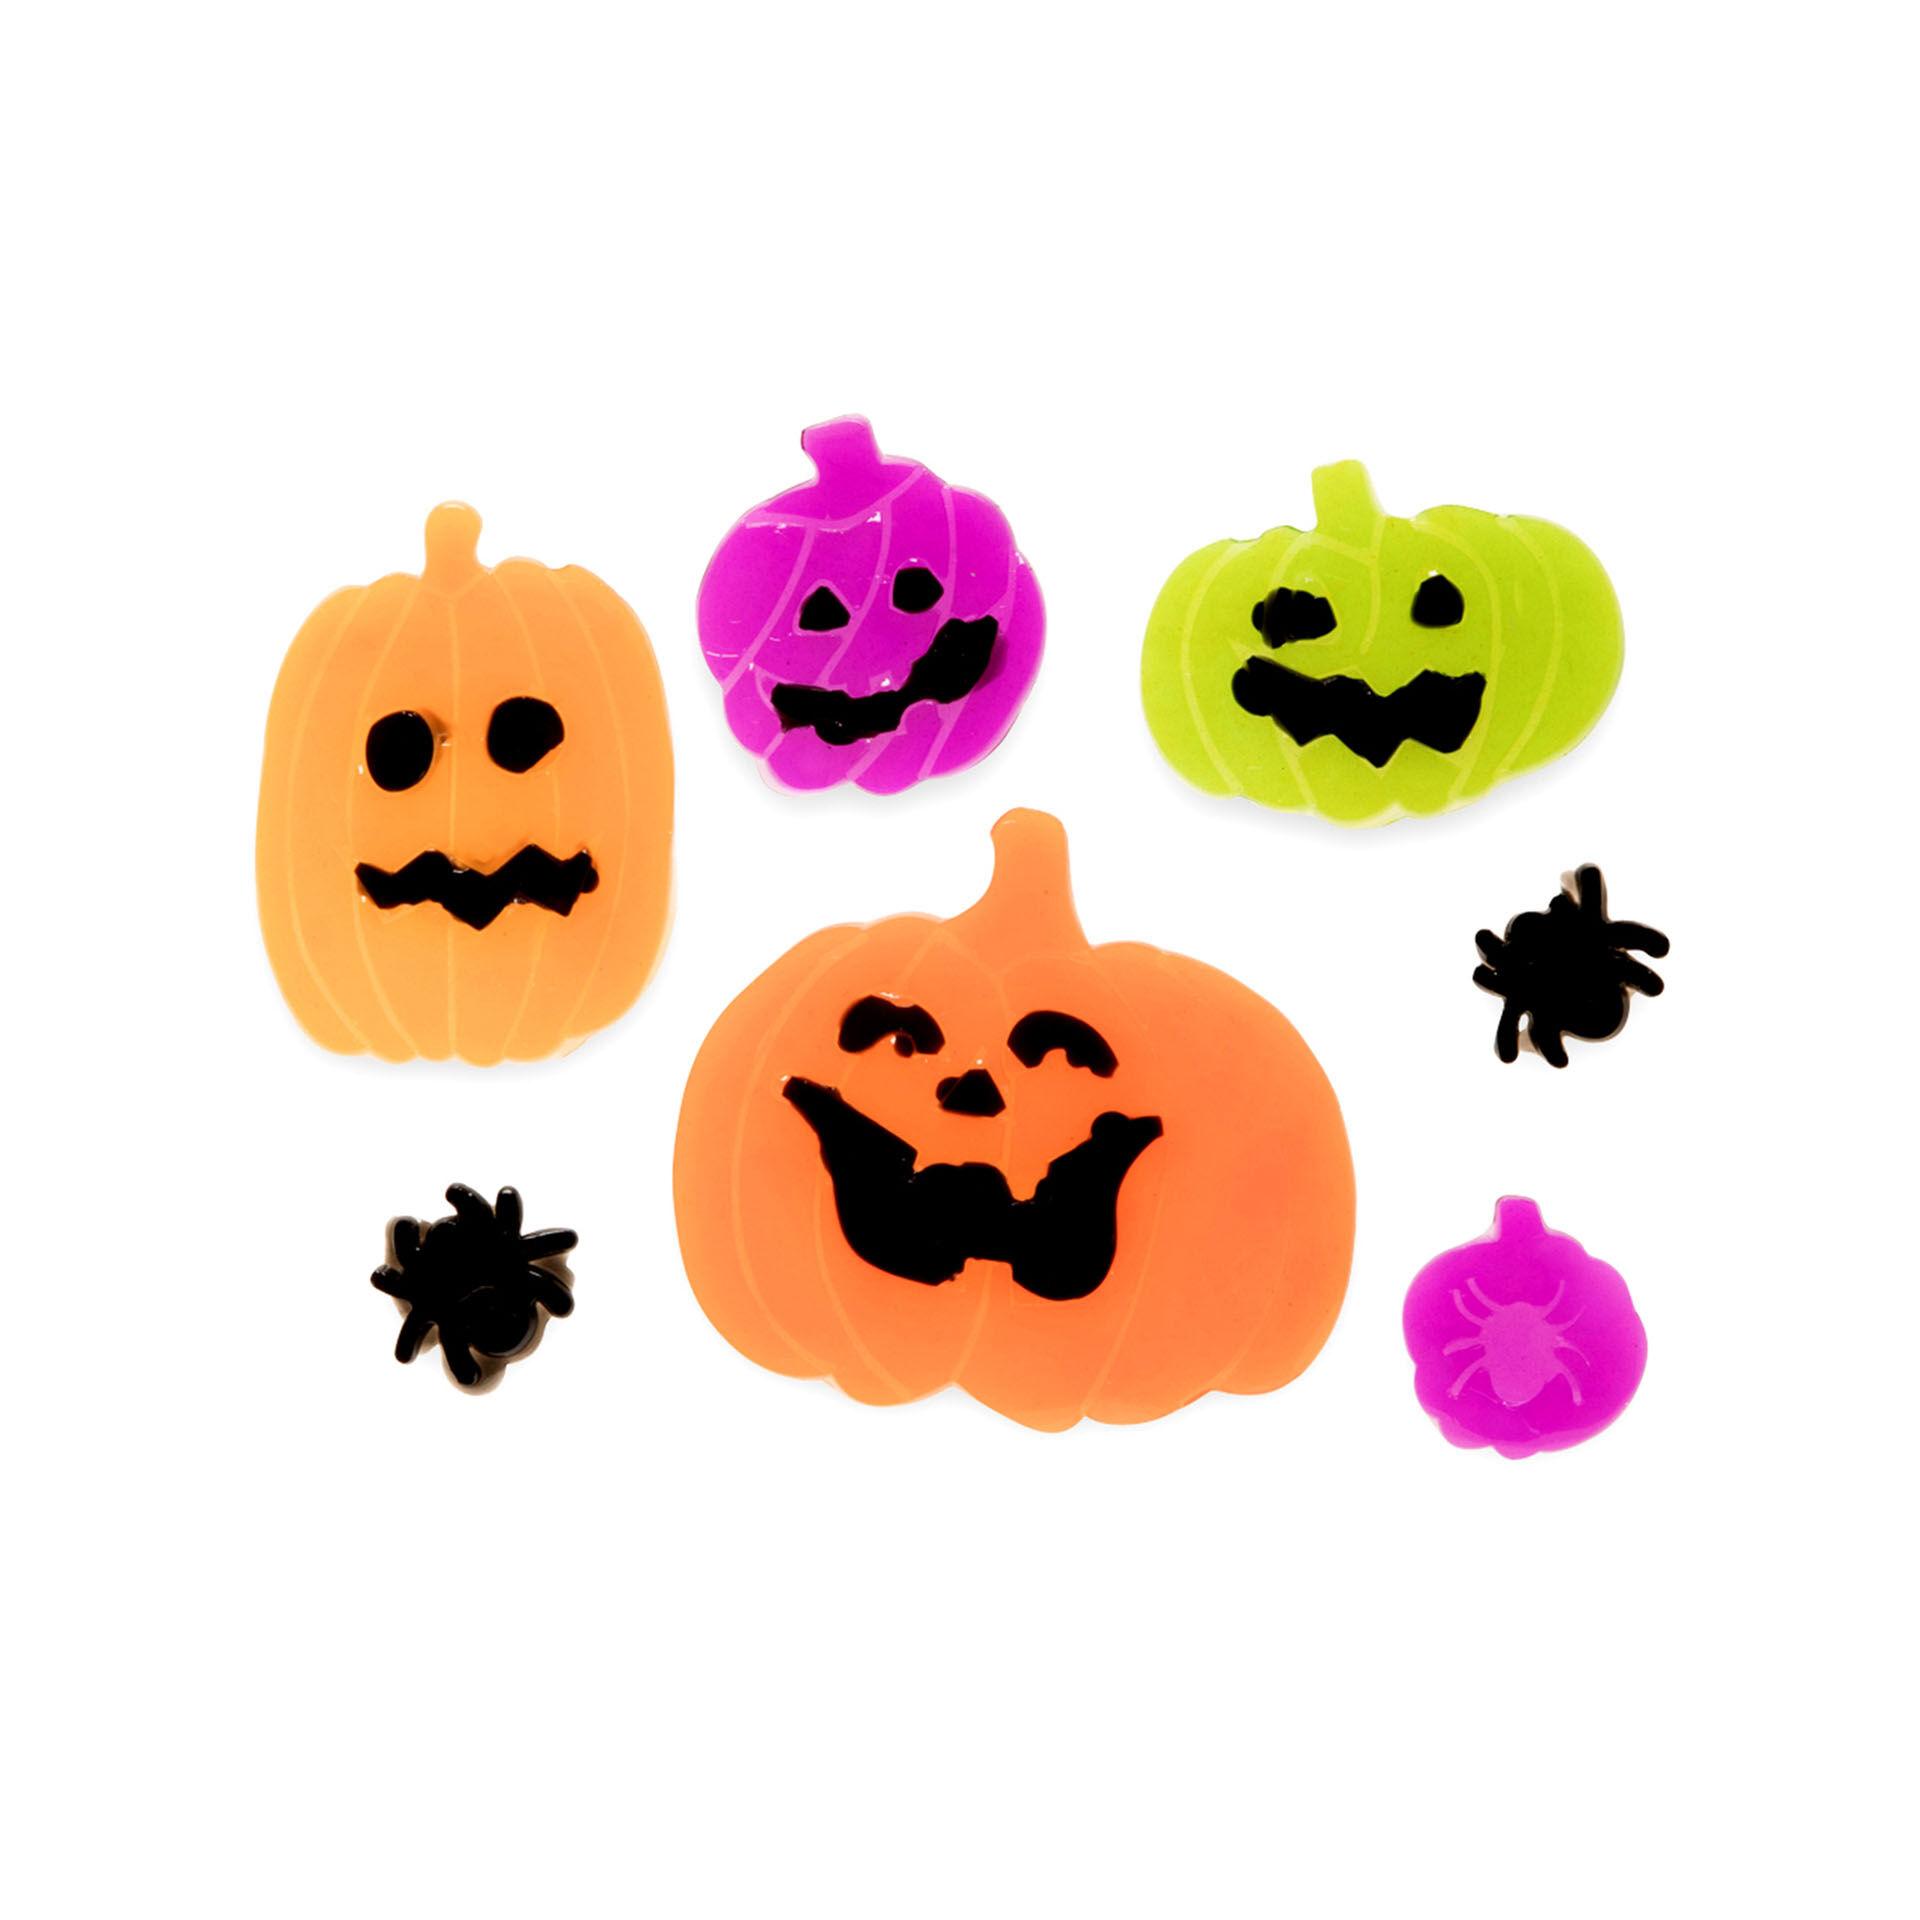 Vitrophanie Halloween - Citrouilles, , large